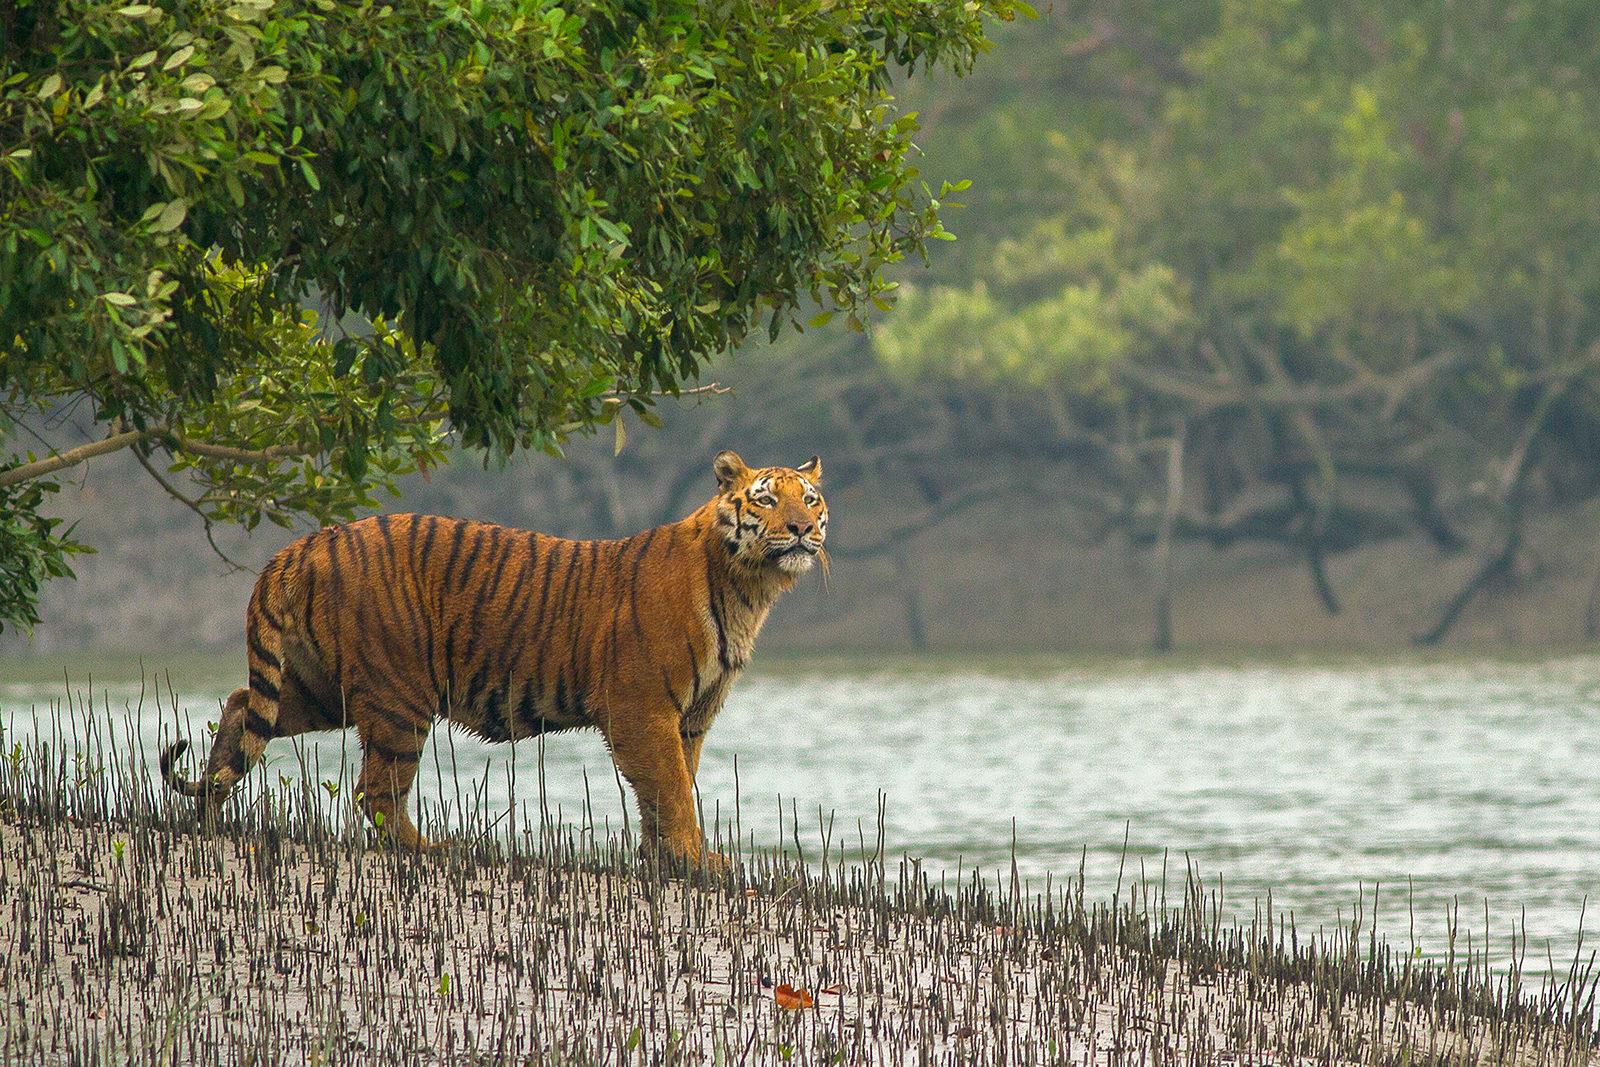 A tiger in the Sundarbans. Photo: Soumyajit Nandy, December 2015